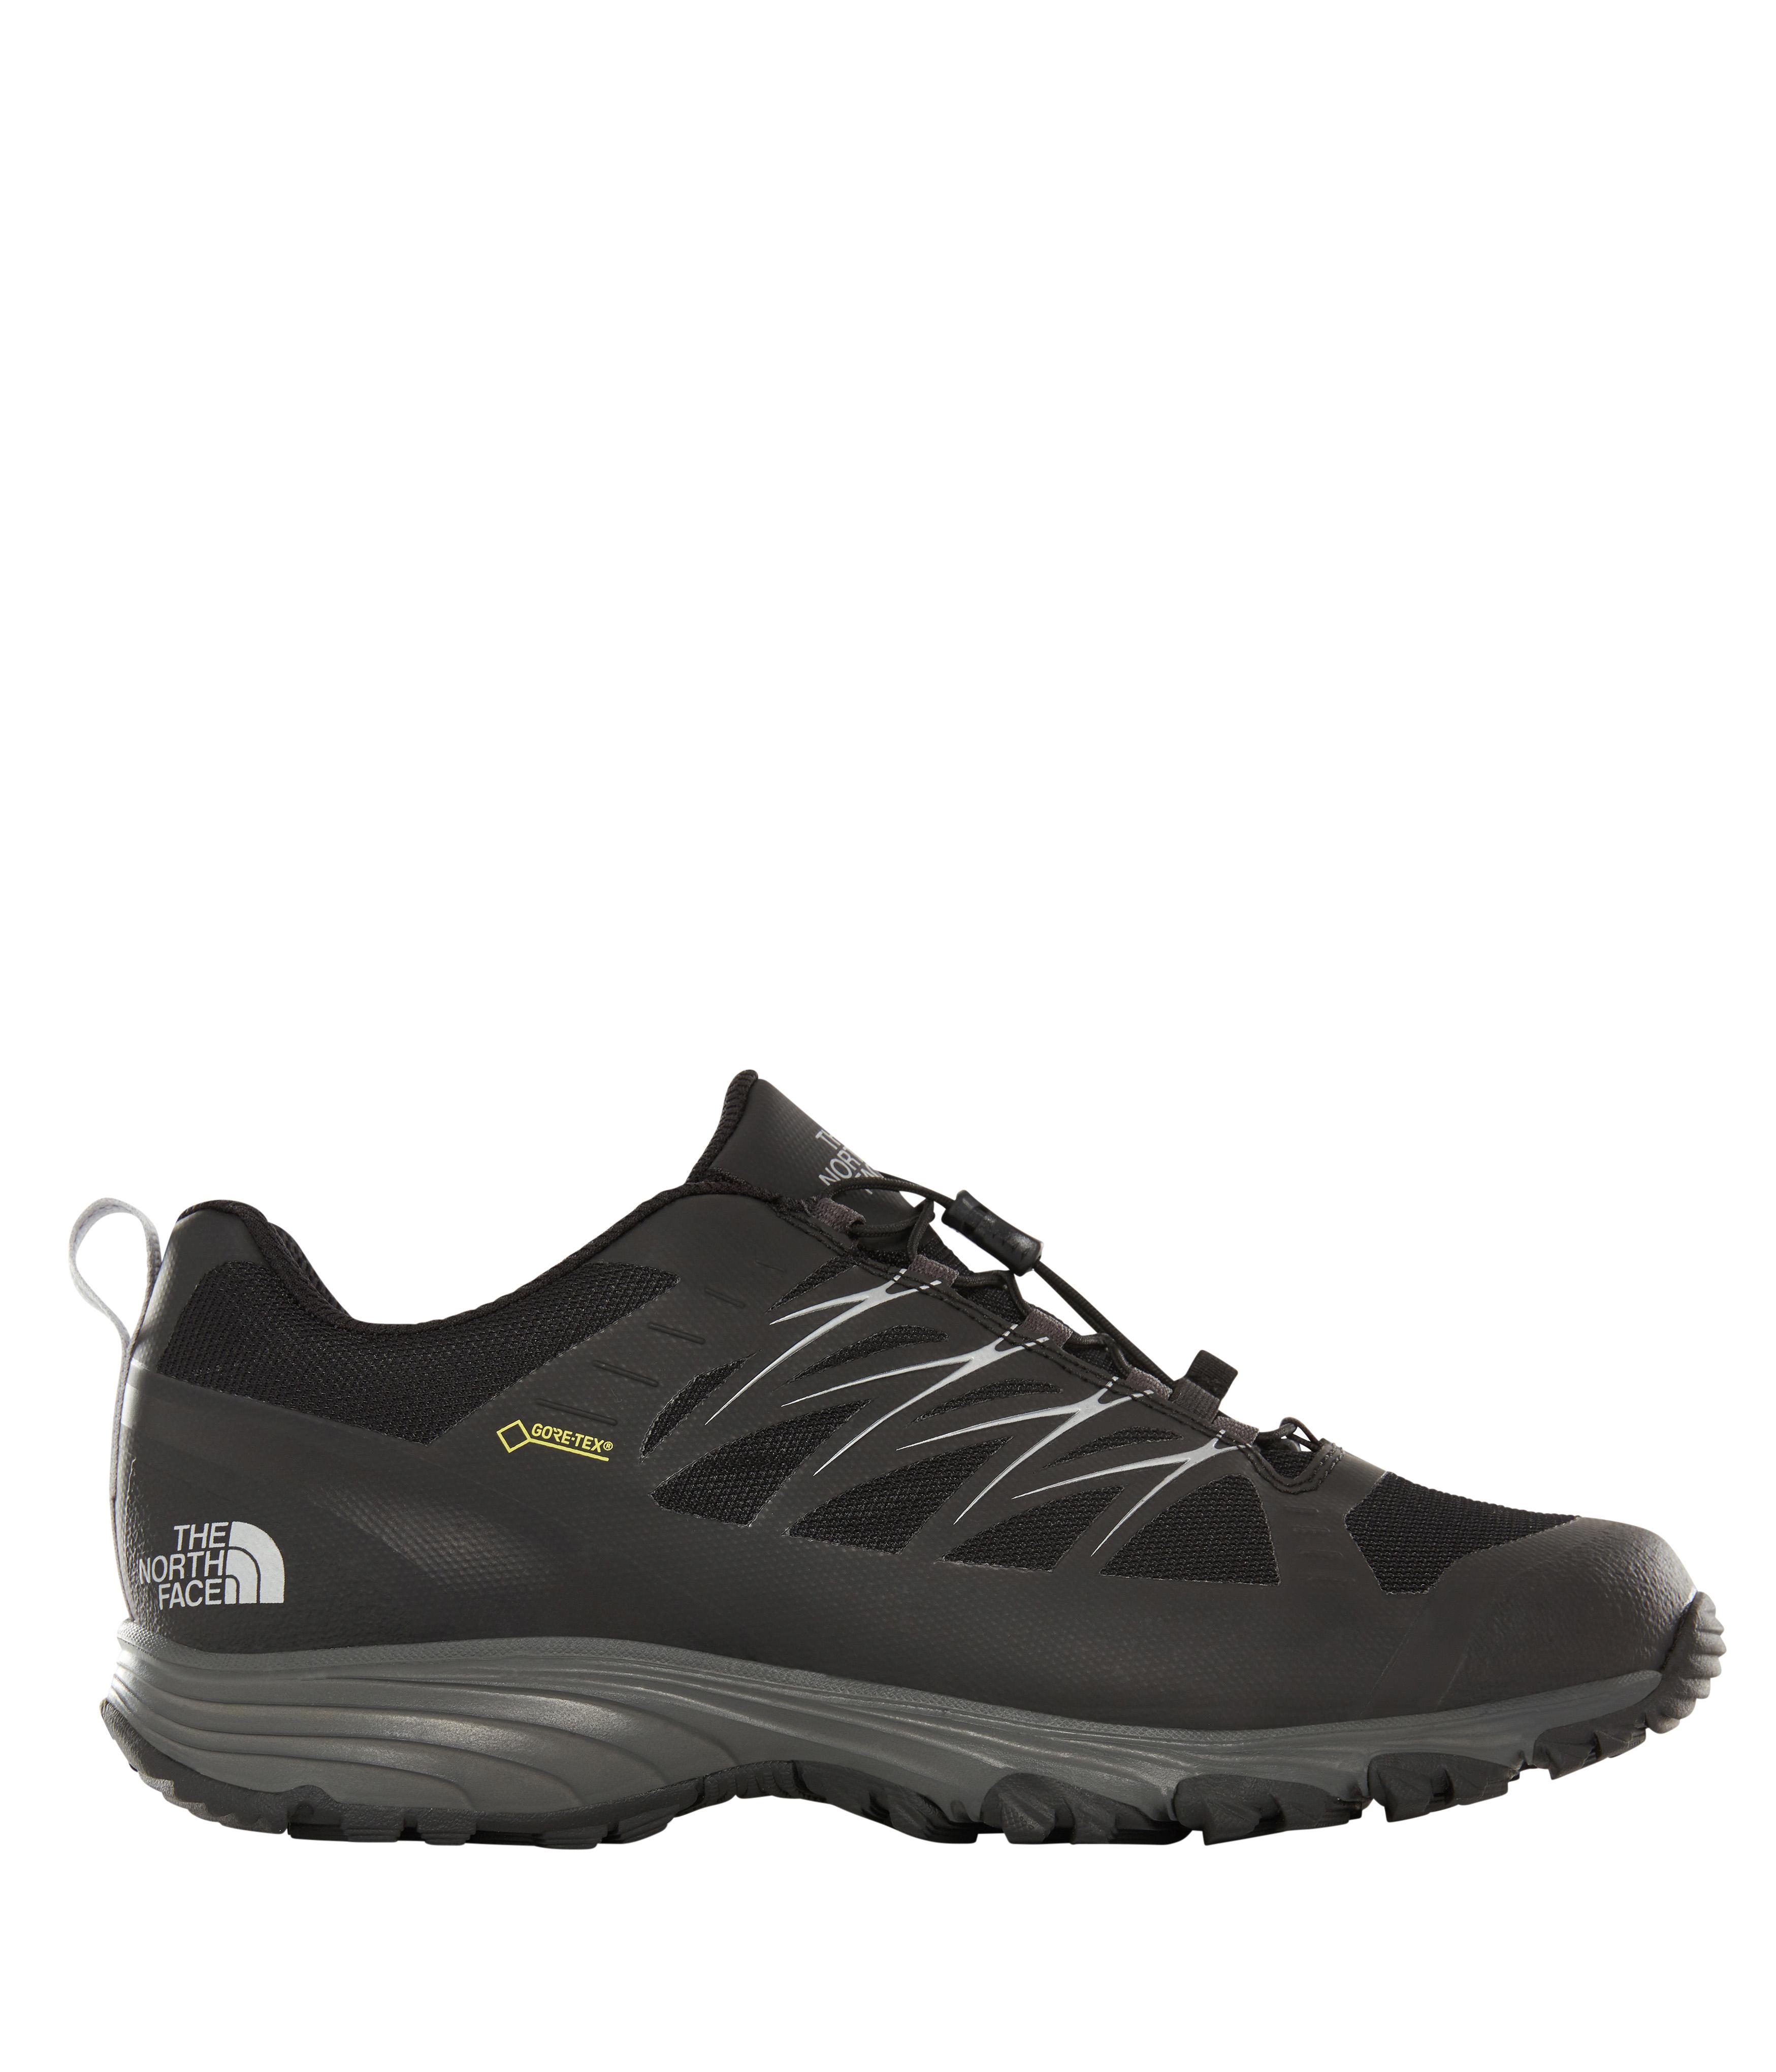 Мужские кроссовки Venture Fastlace GORE-TEX® Hiking фото